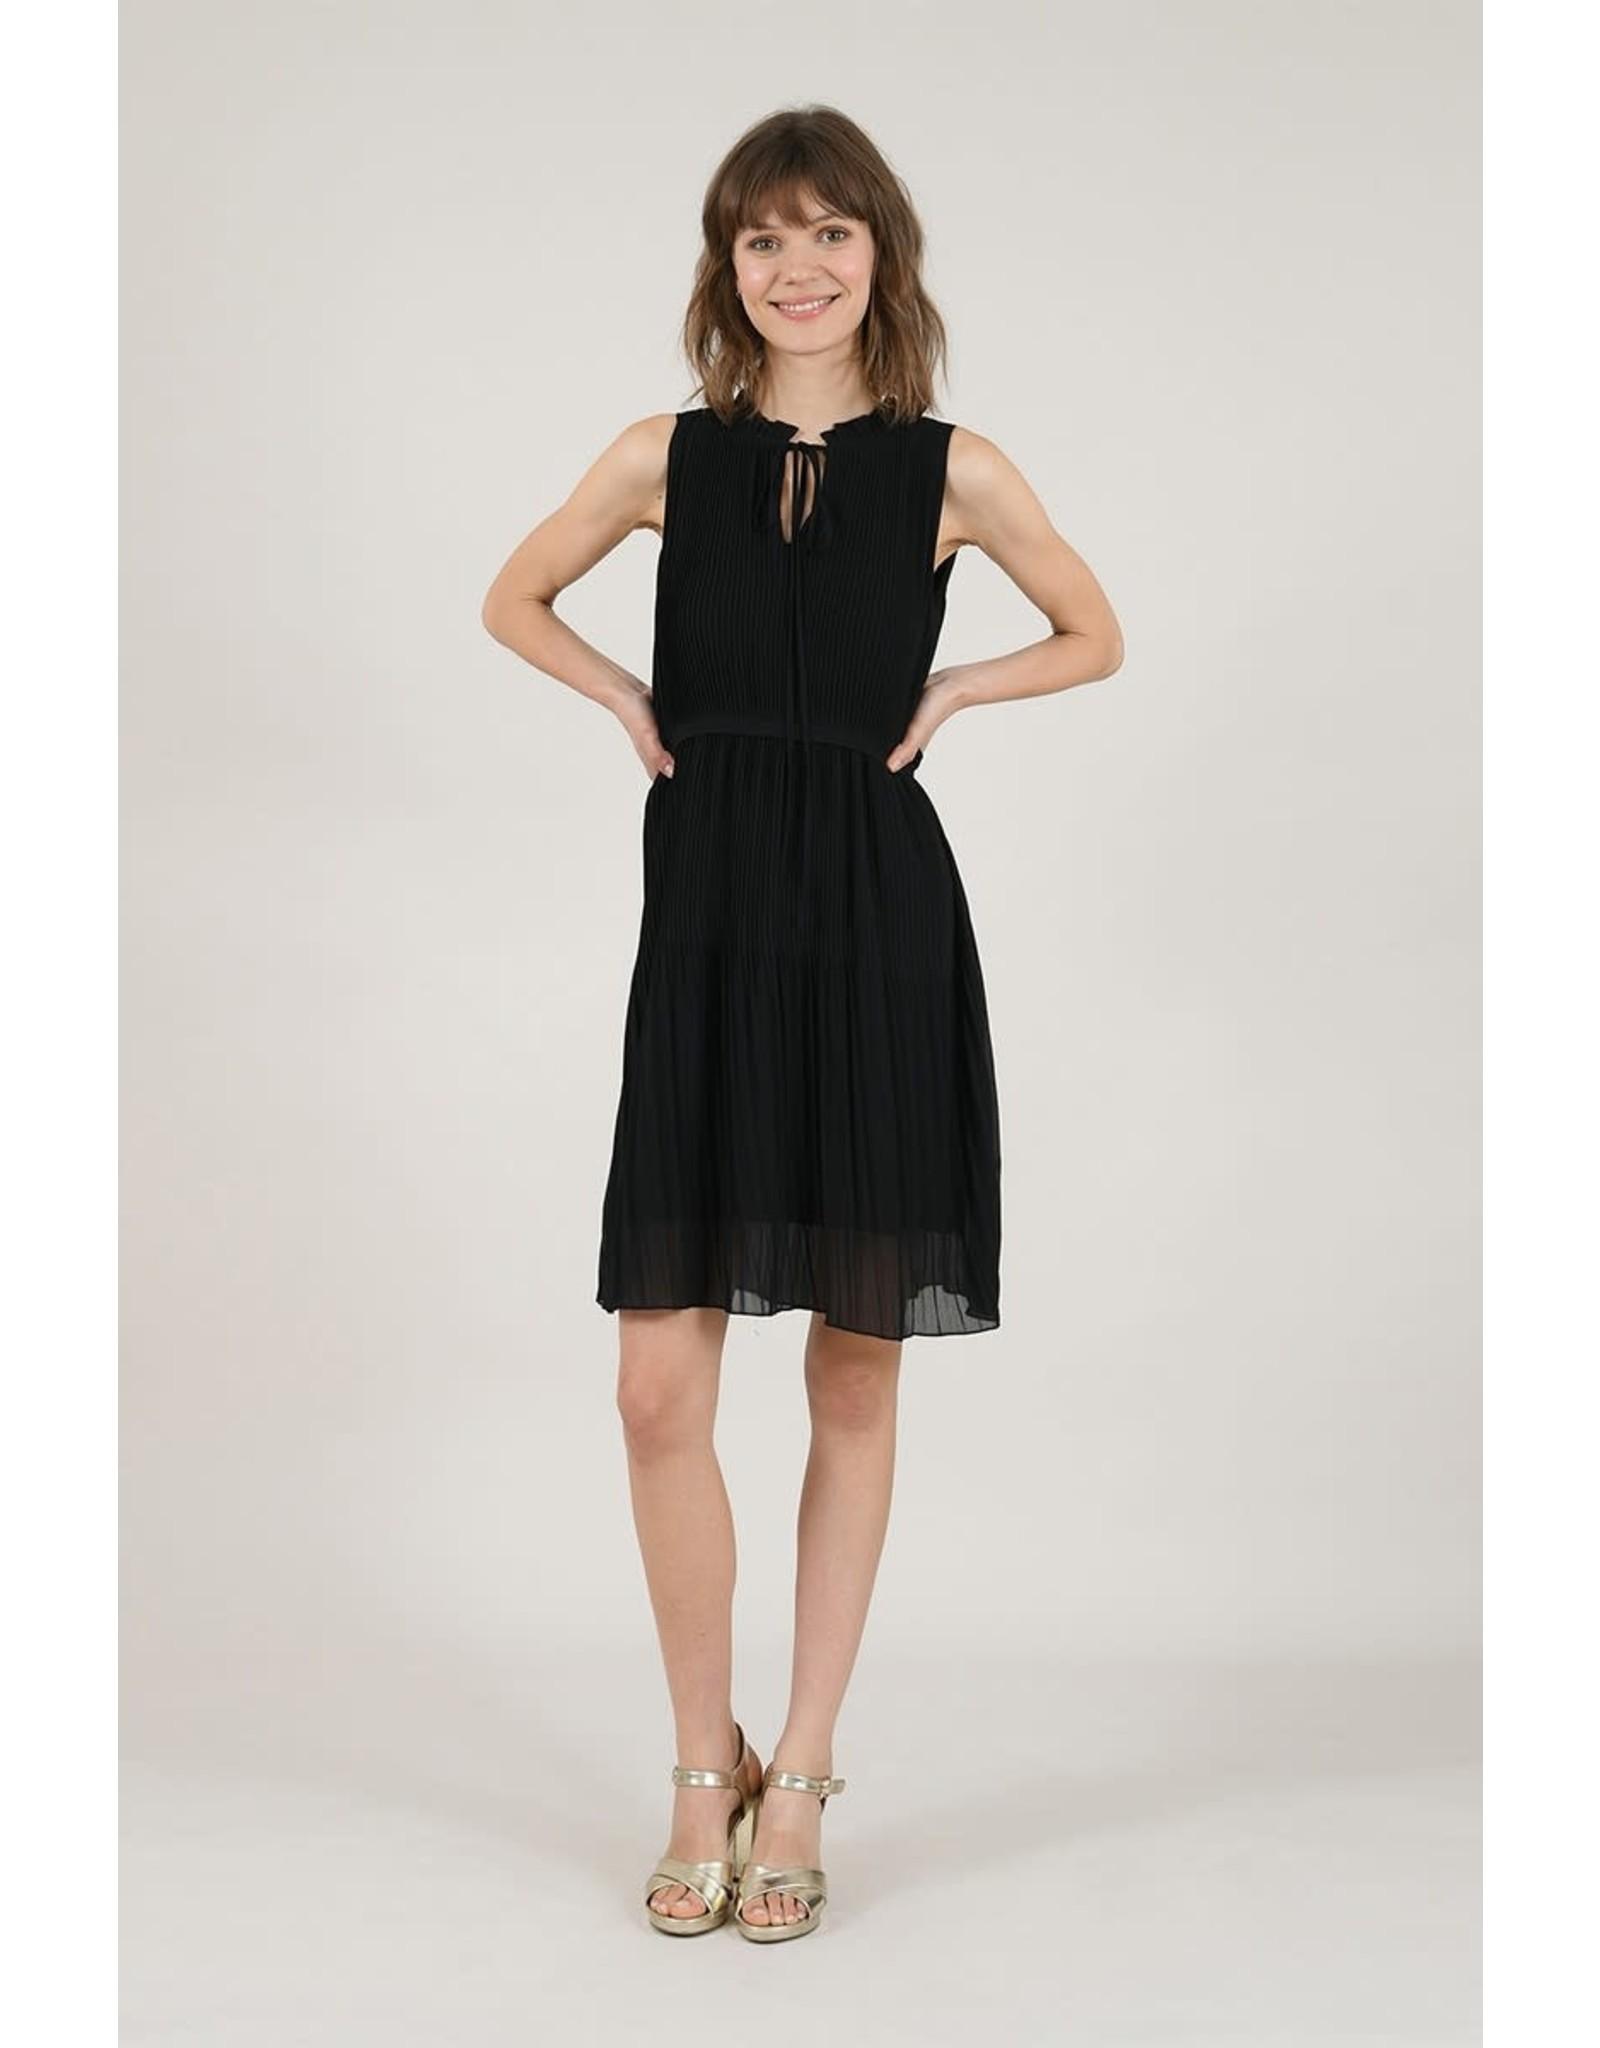 Molly Bracken, Shirring Mimi Dress, Black